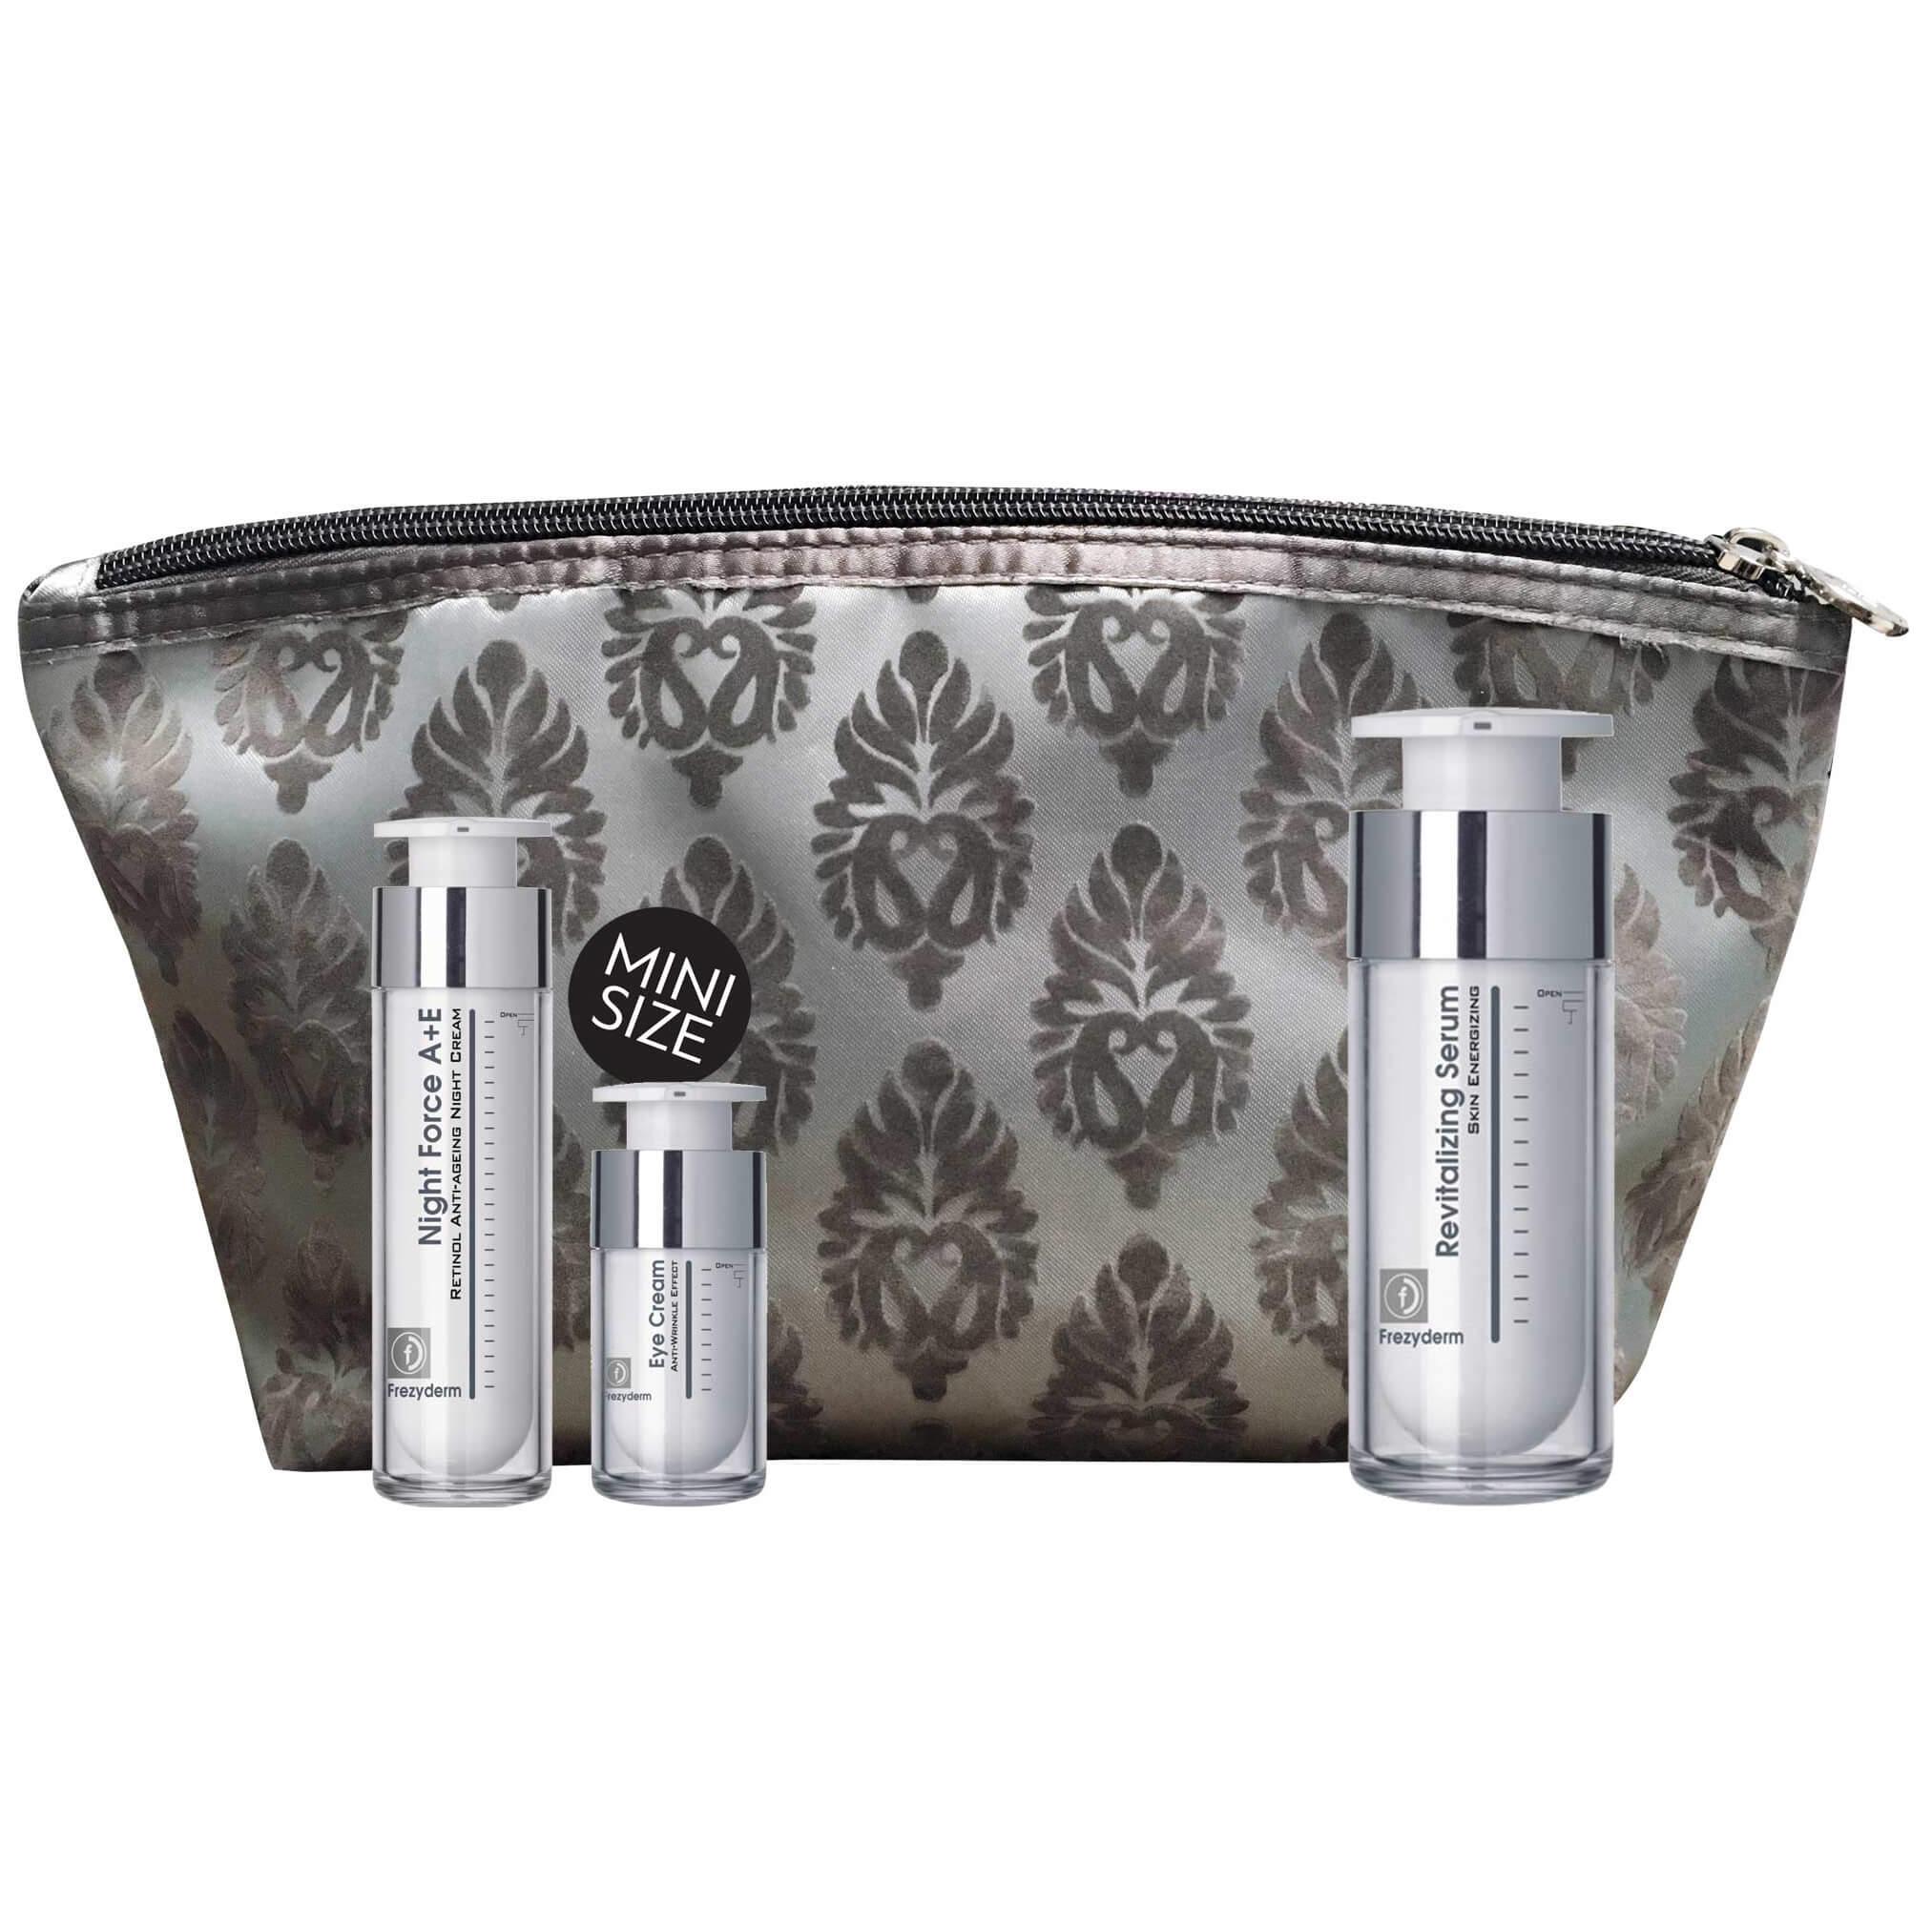 Frezyderm Πακέτο Προσφοράς Revitalizing Serum 30ml & Δώρο Night Force A+E Cream 10ml & Eye Balm Cream 5ml & Νεσεσέρ